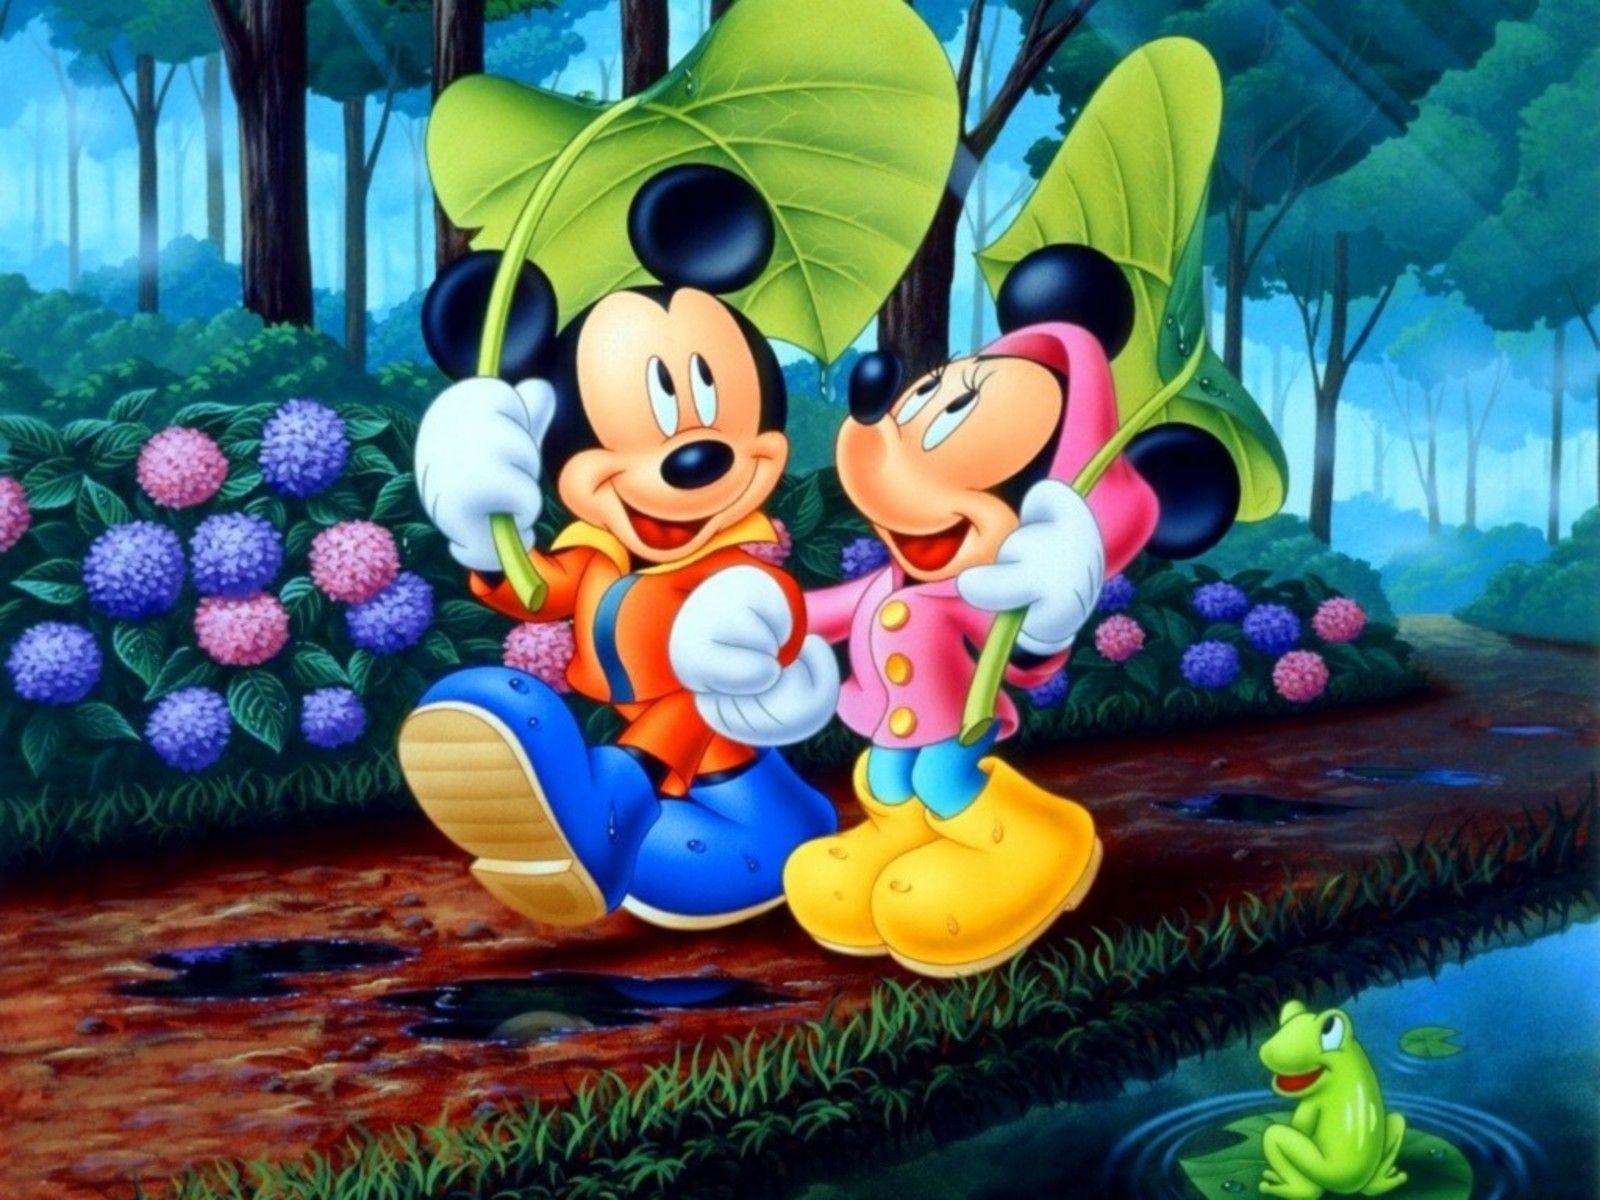 Good Disney Cartoon Mickey Mouse Wallpaper HD 5 High Resolution Wallpaper Full  Size